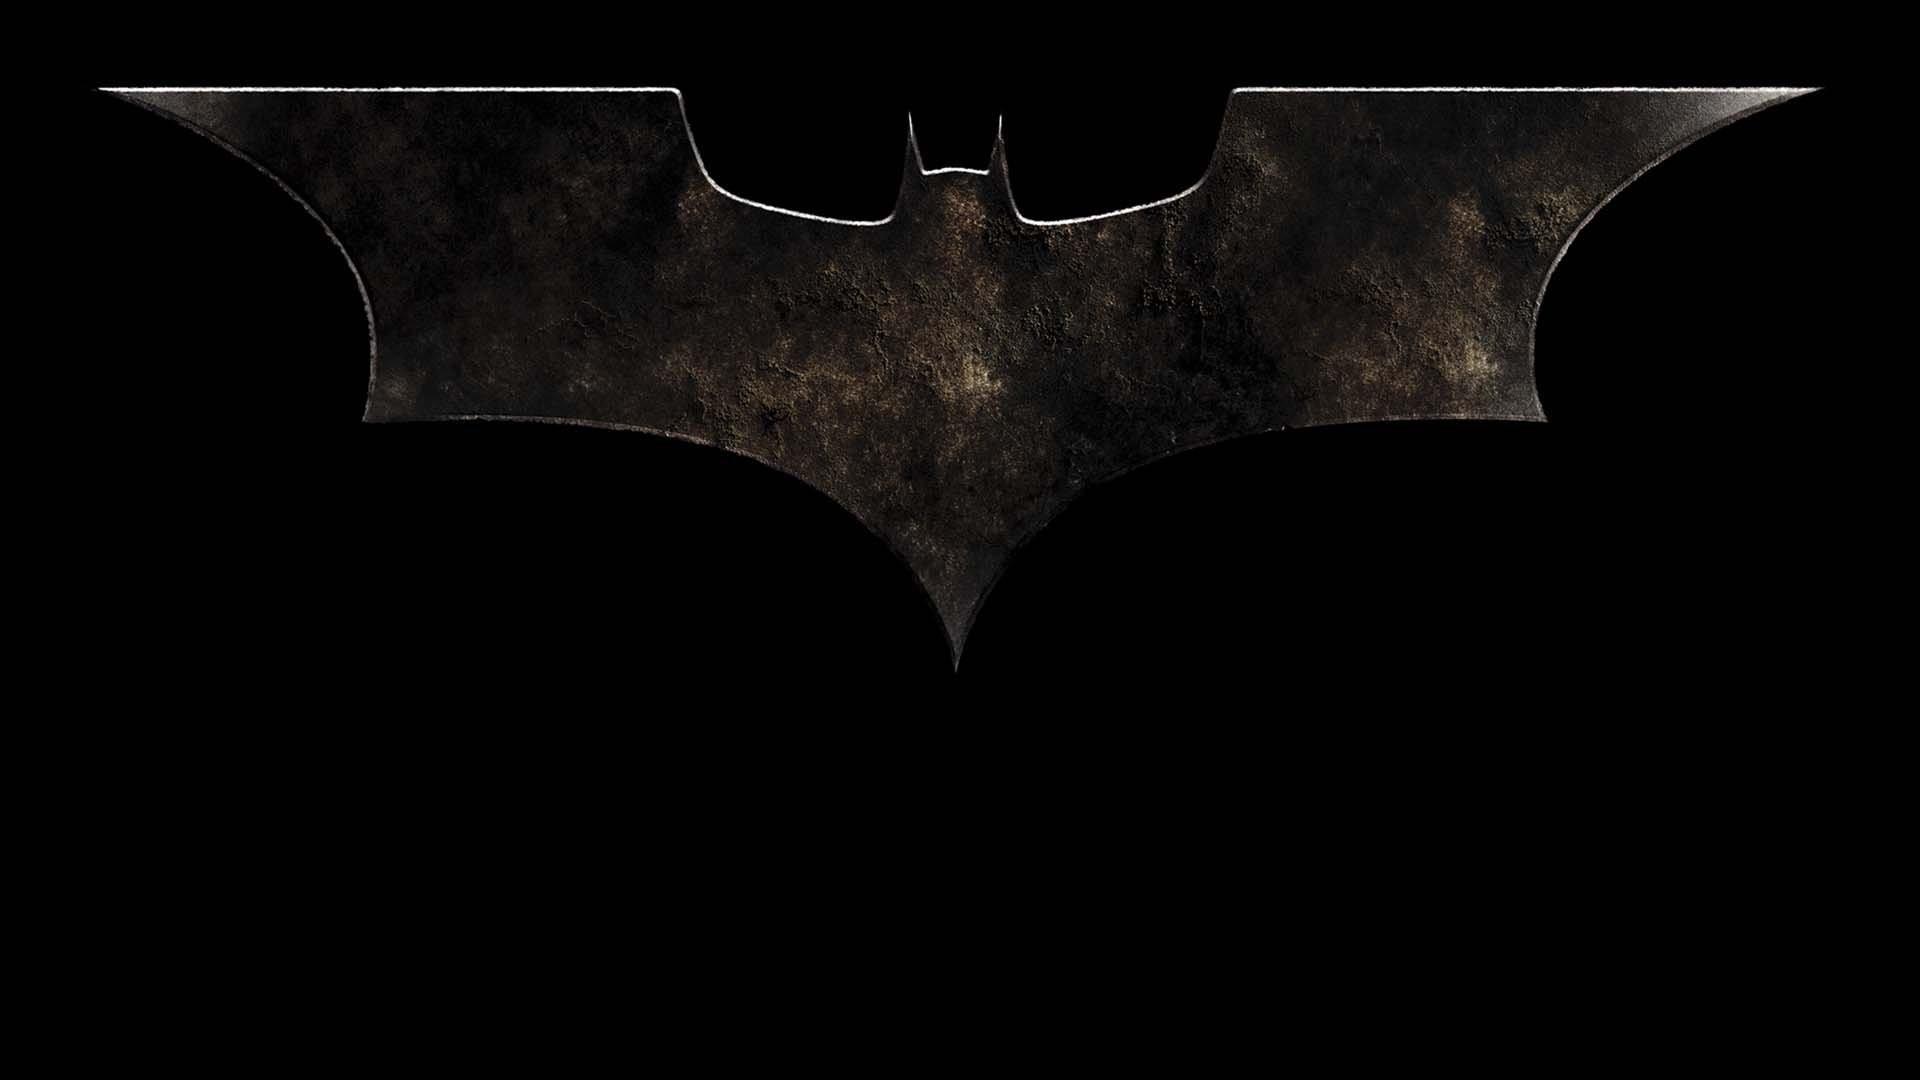 Free Batman Logo Batman Begins, Download Free Clip Art, Free.